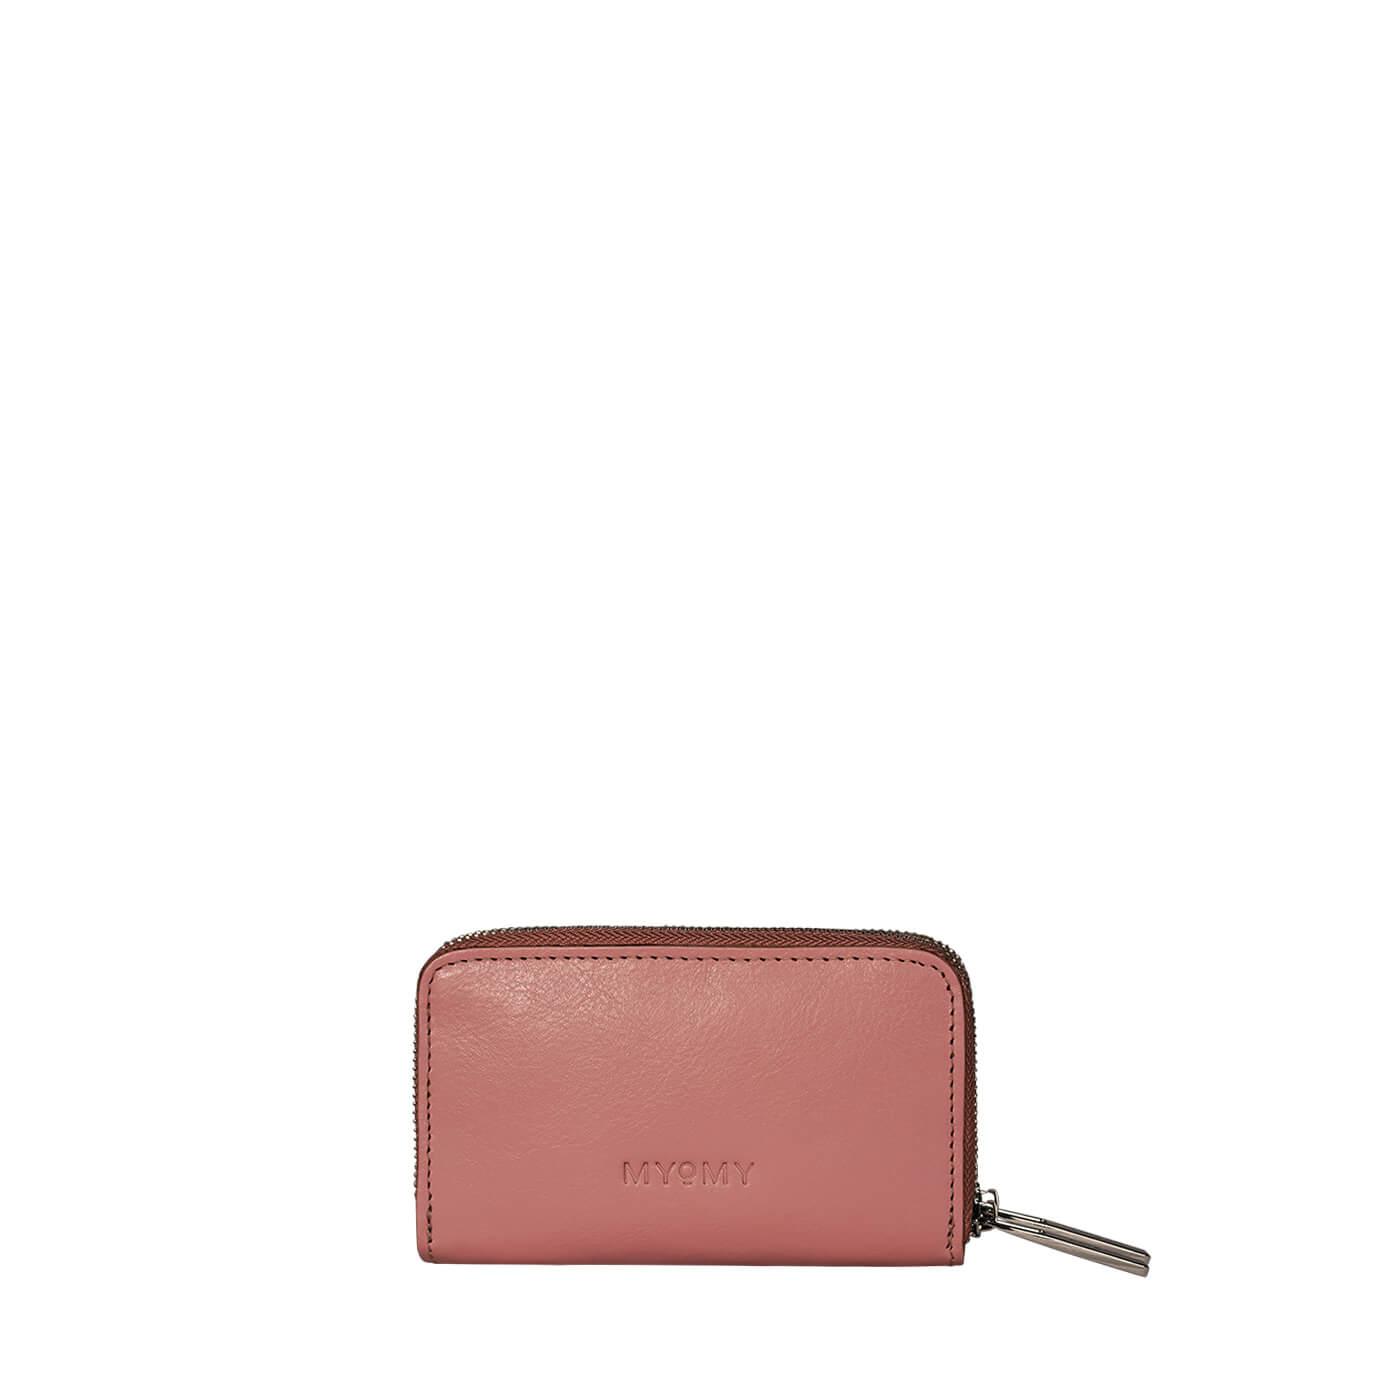 MY CARRY BAG Wallet Medium (RFID) - hunter waxy pink